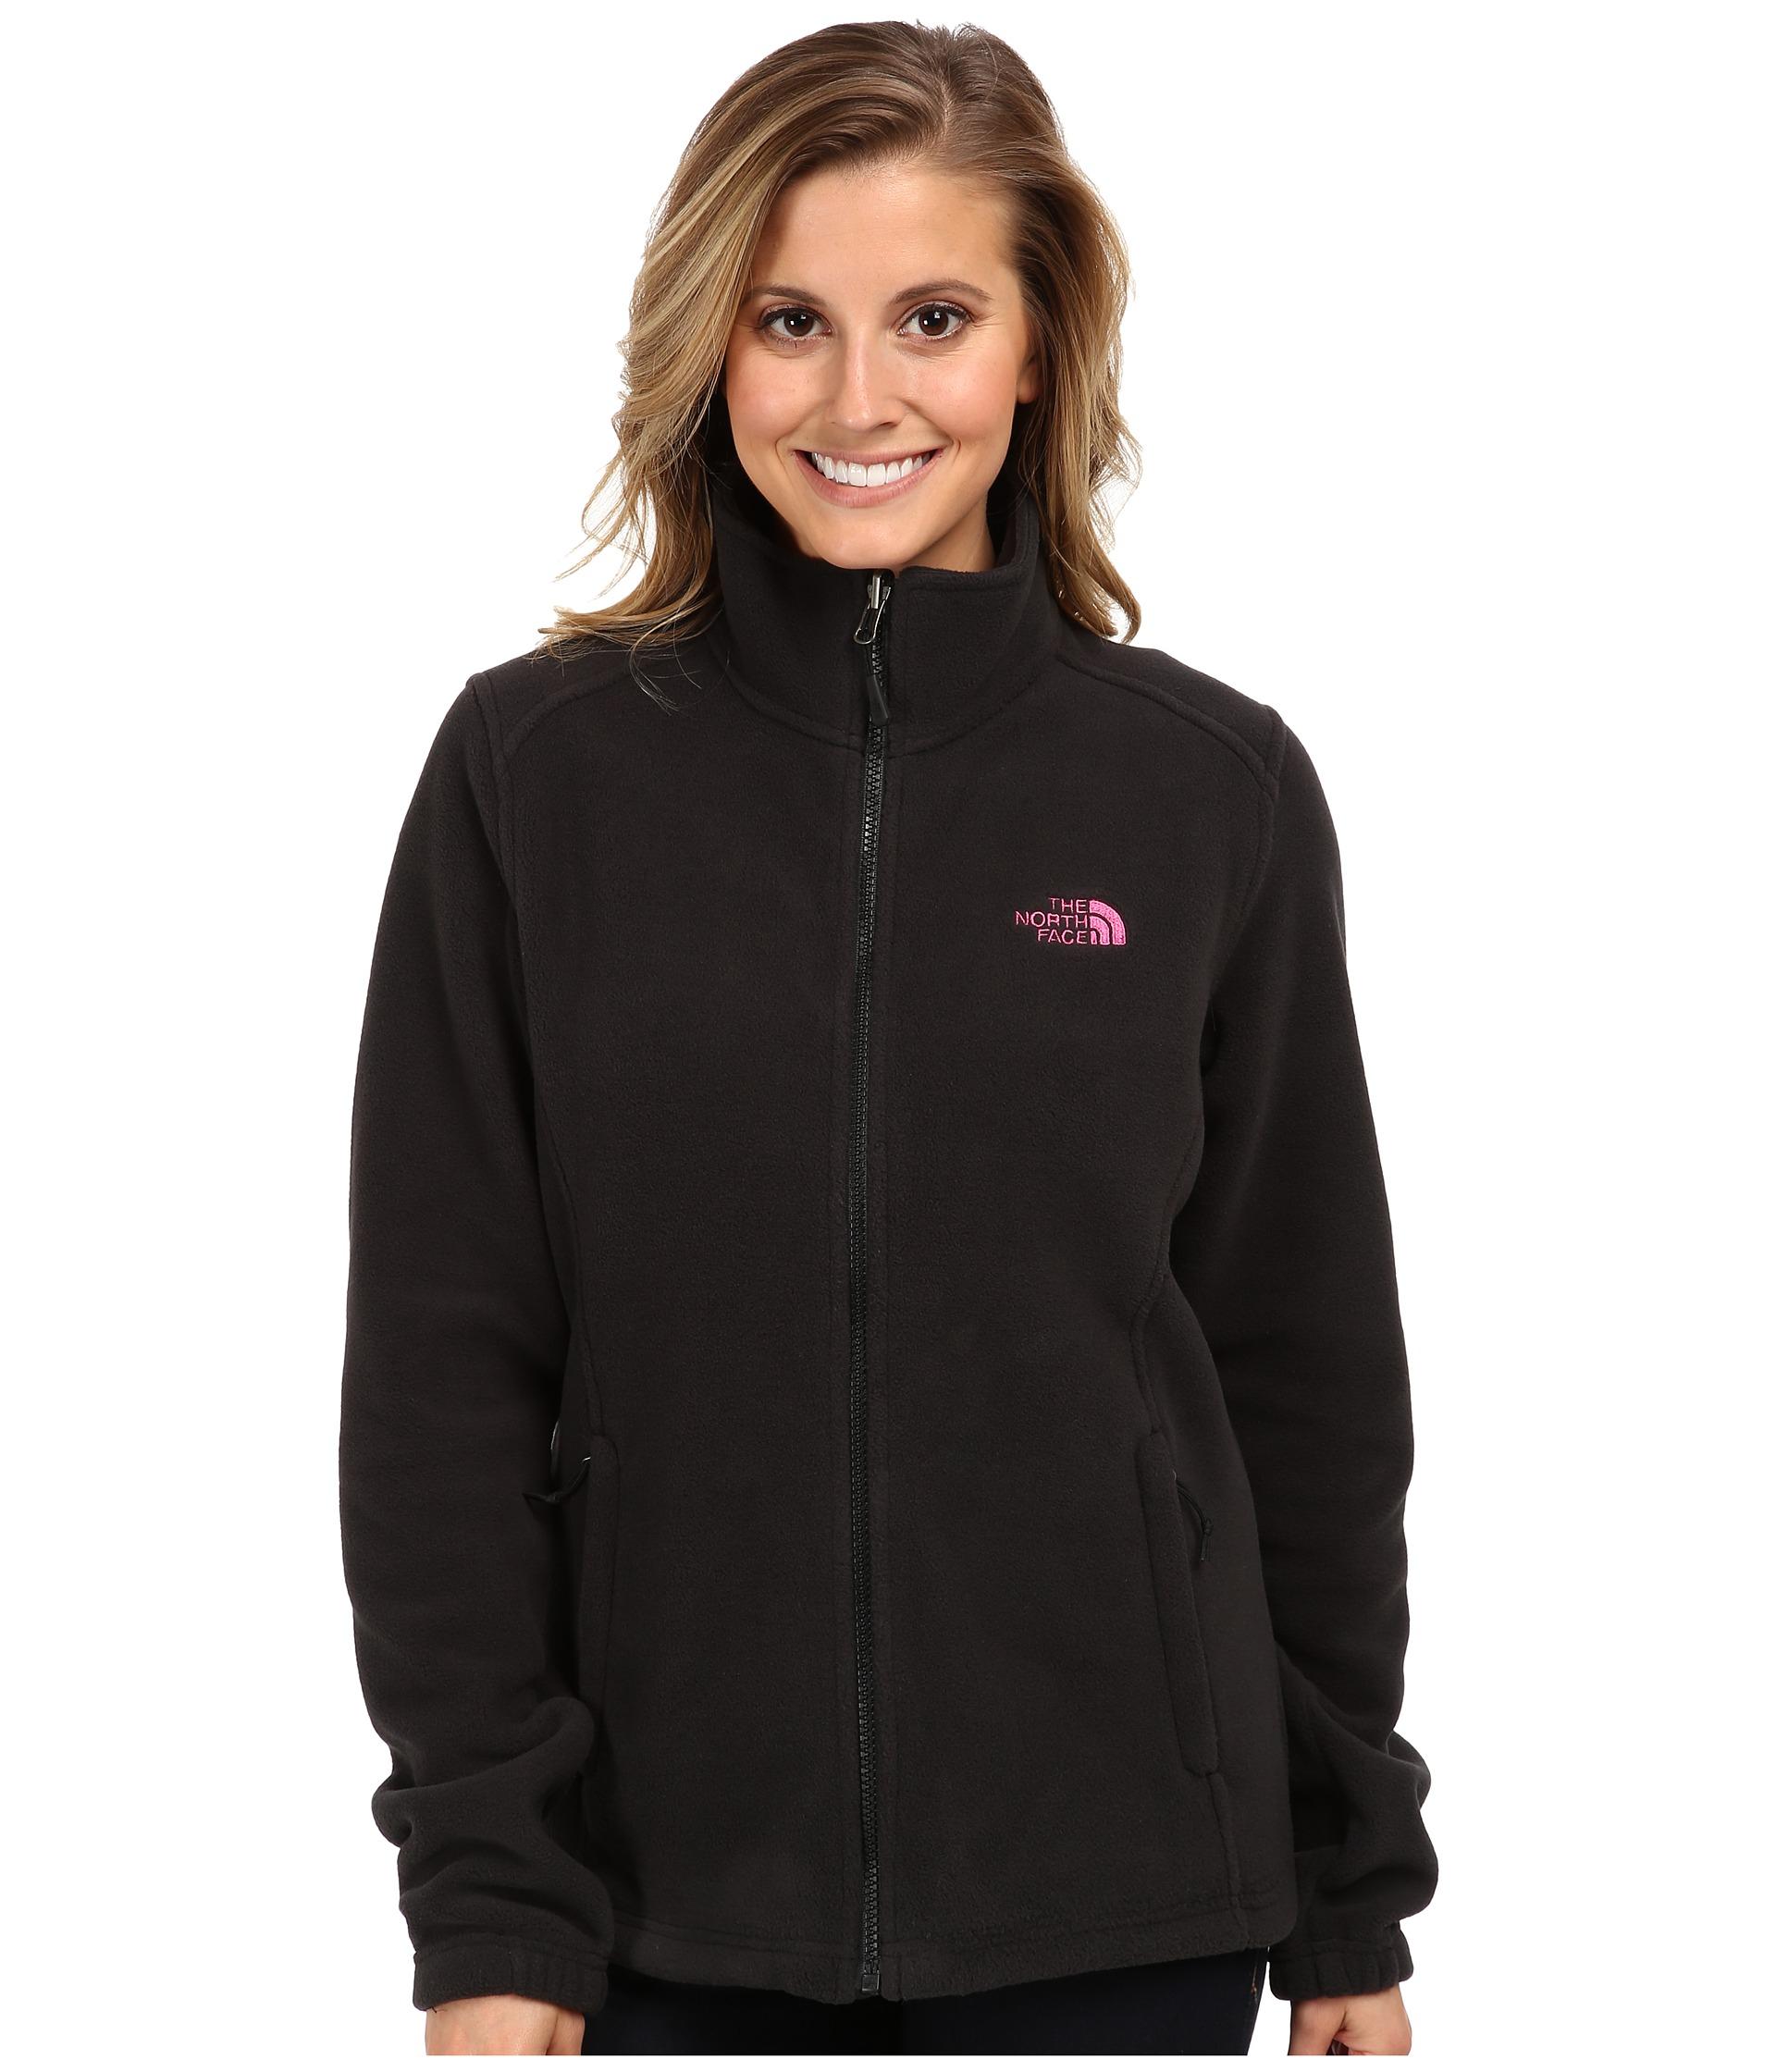 f65b22adb The North Face Black Pink Ribbon Khumbu 2 Jacket